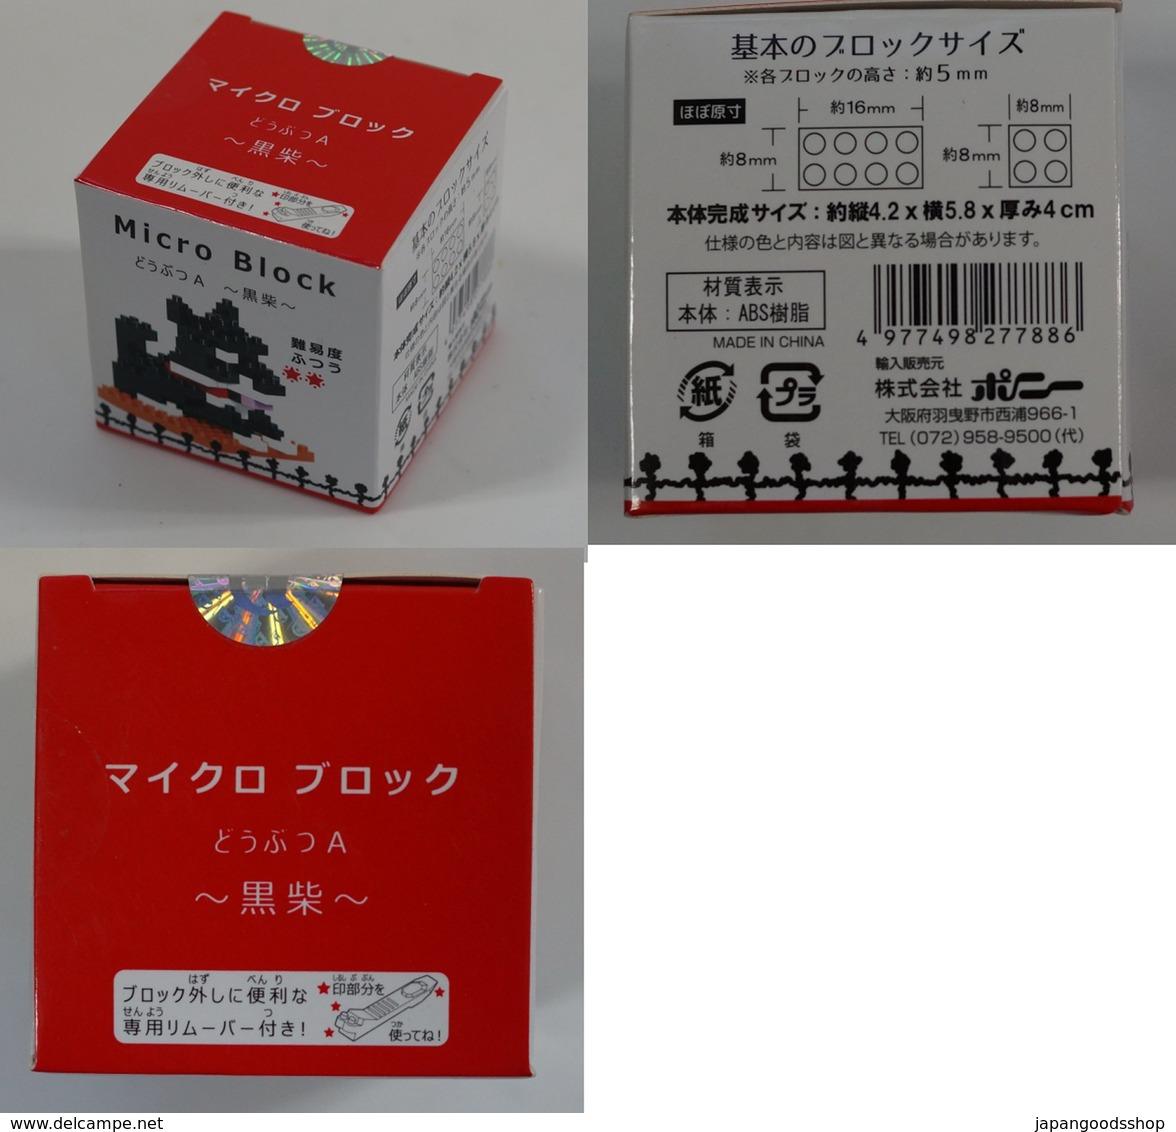 Micro Blocks : Kuro Shiba - Other